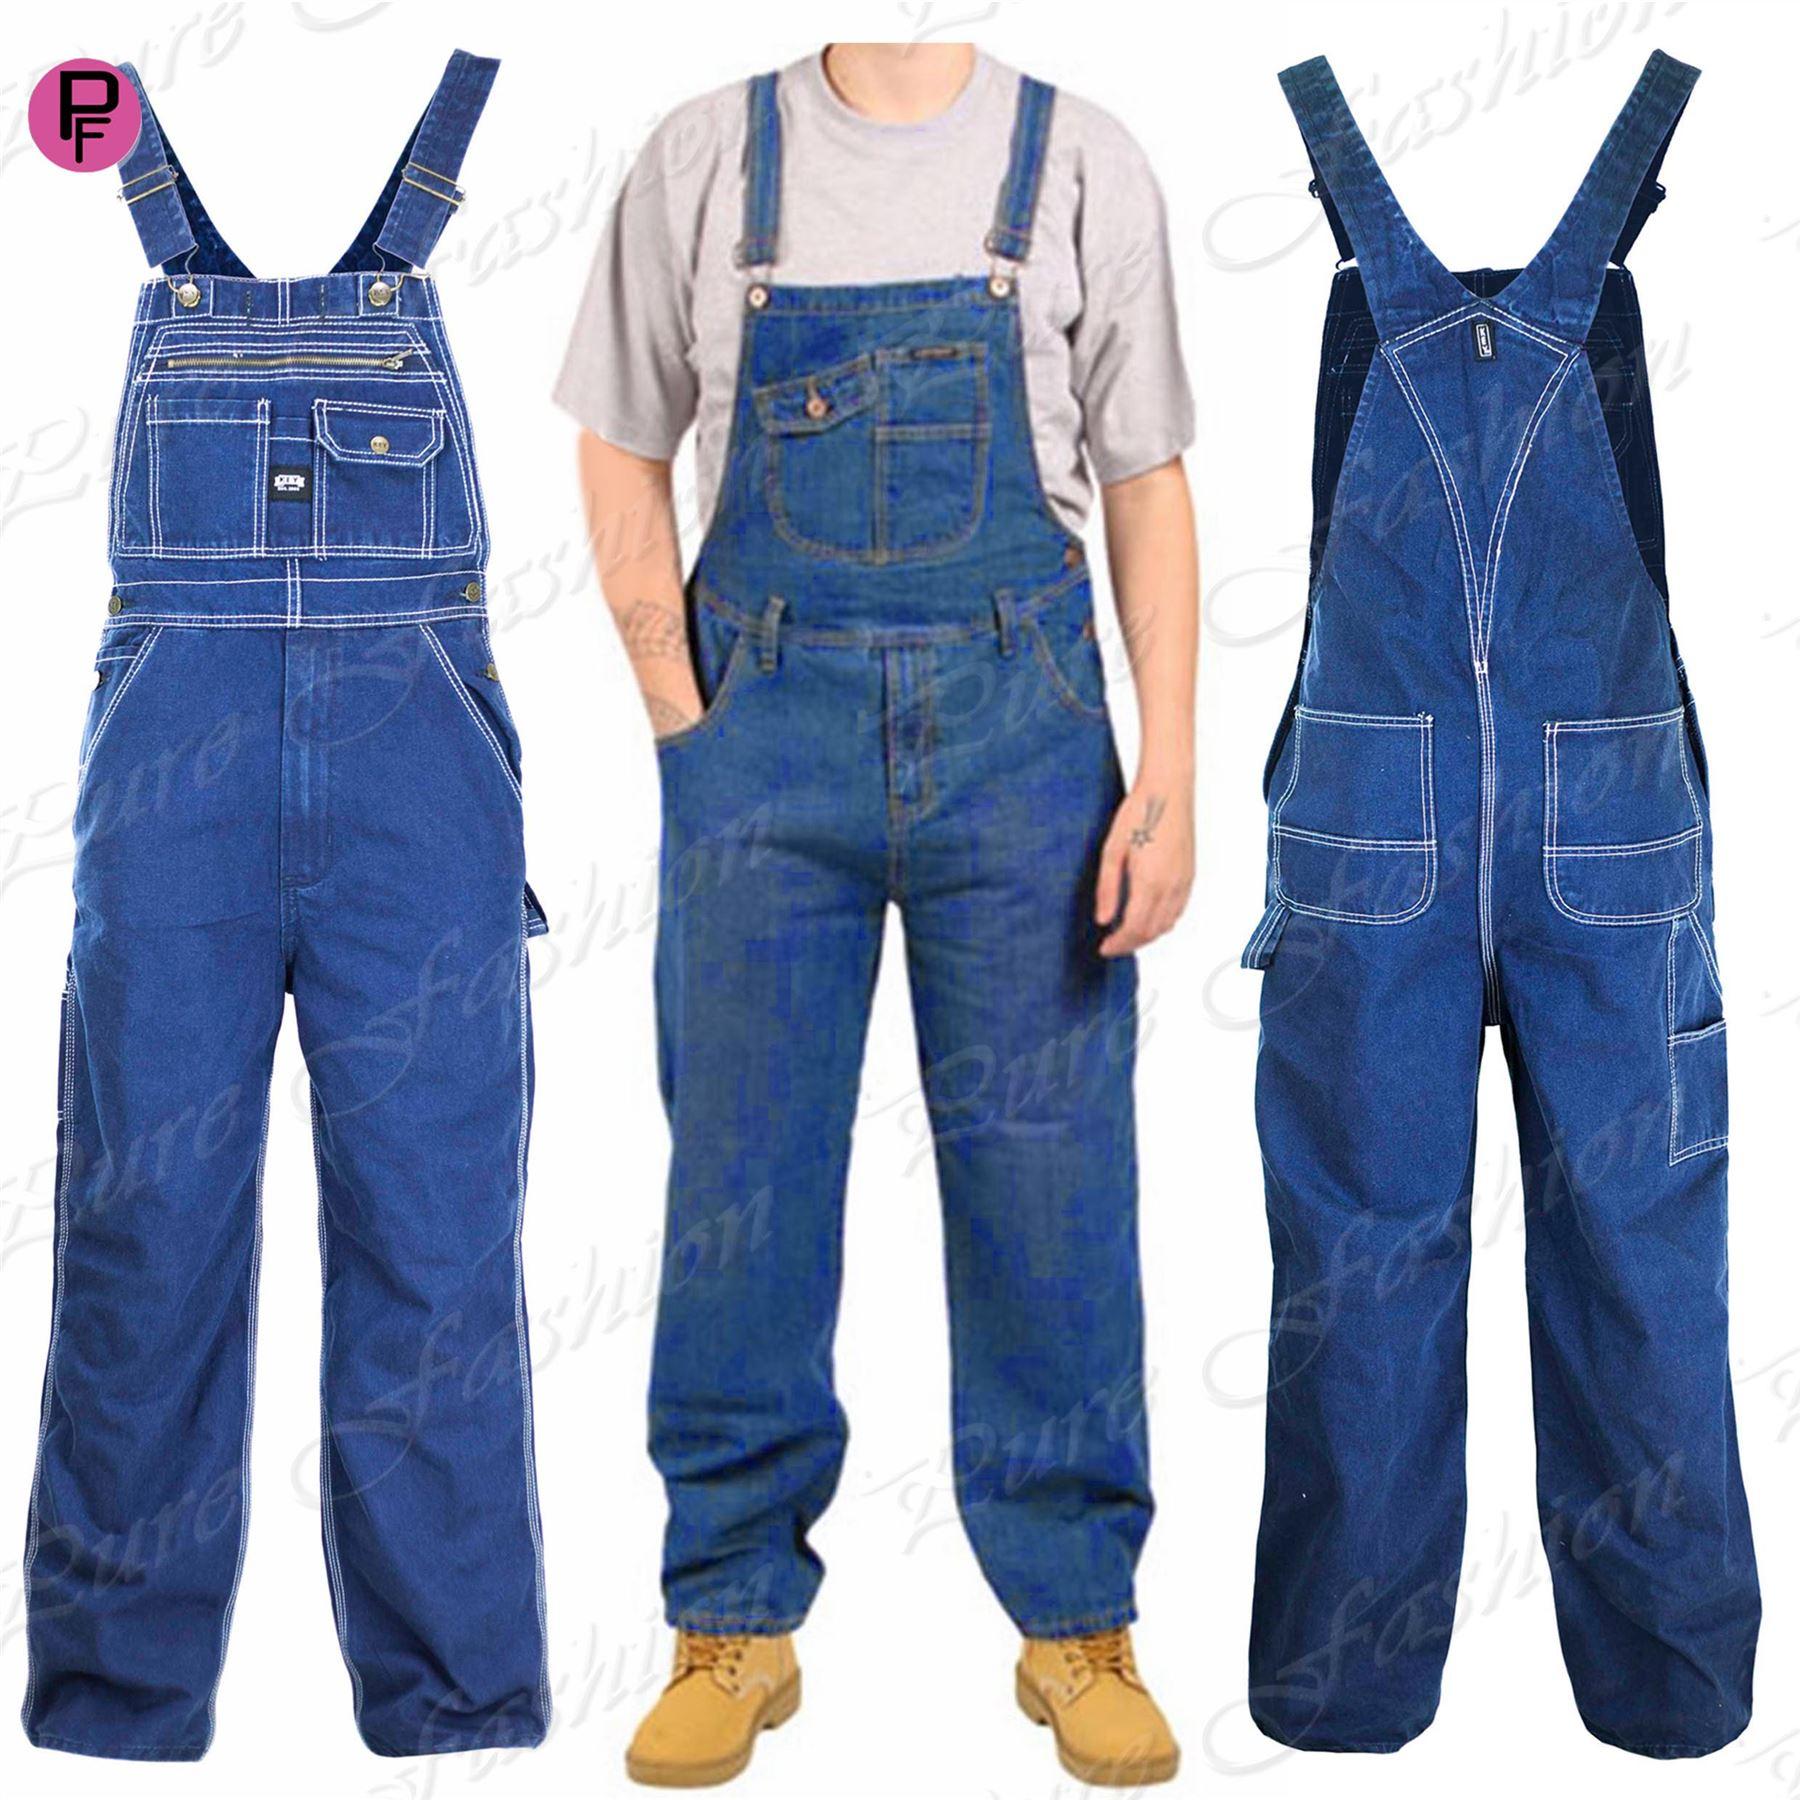 Mens Loose Fit Bib Denim All In One Piece Jeans Work Overalls Onesie ... 7ee93d971cb